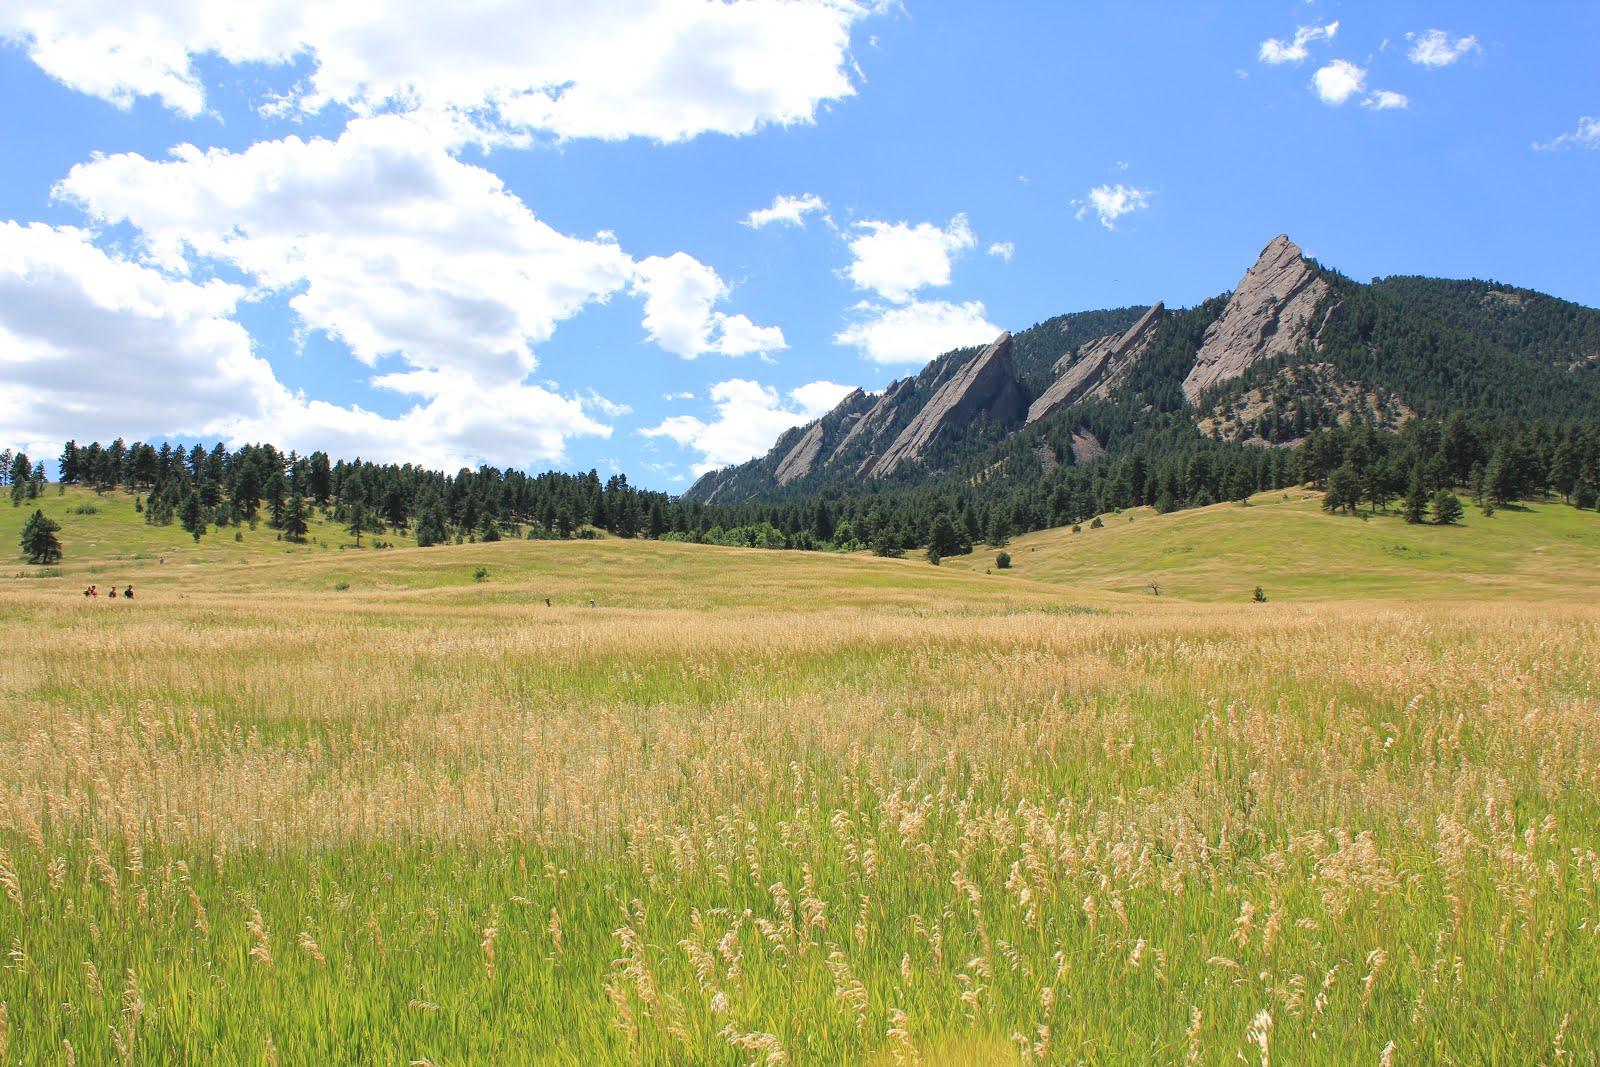 10 Outdoor Adventures To Have In Colorado This Weekend